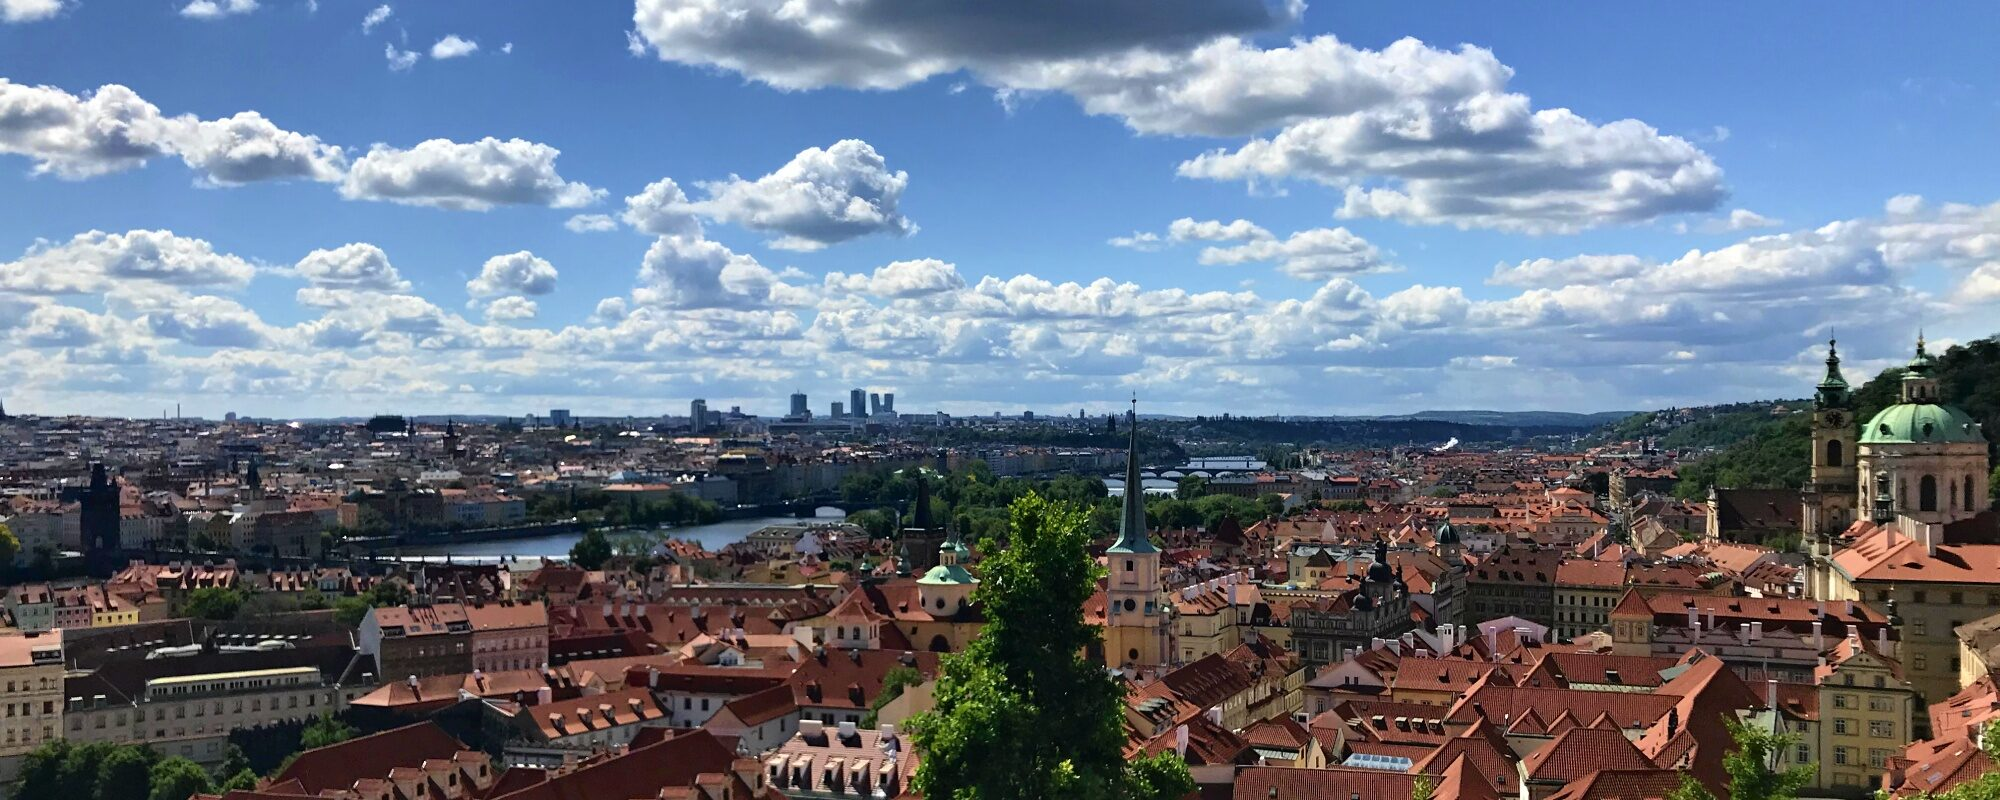 Prague Czechia Cityscape